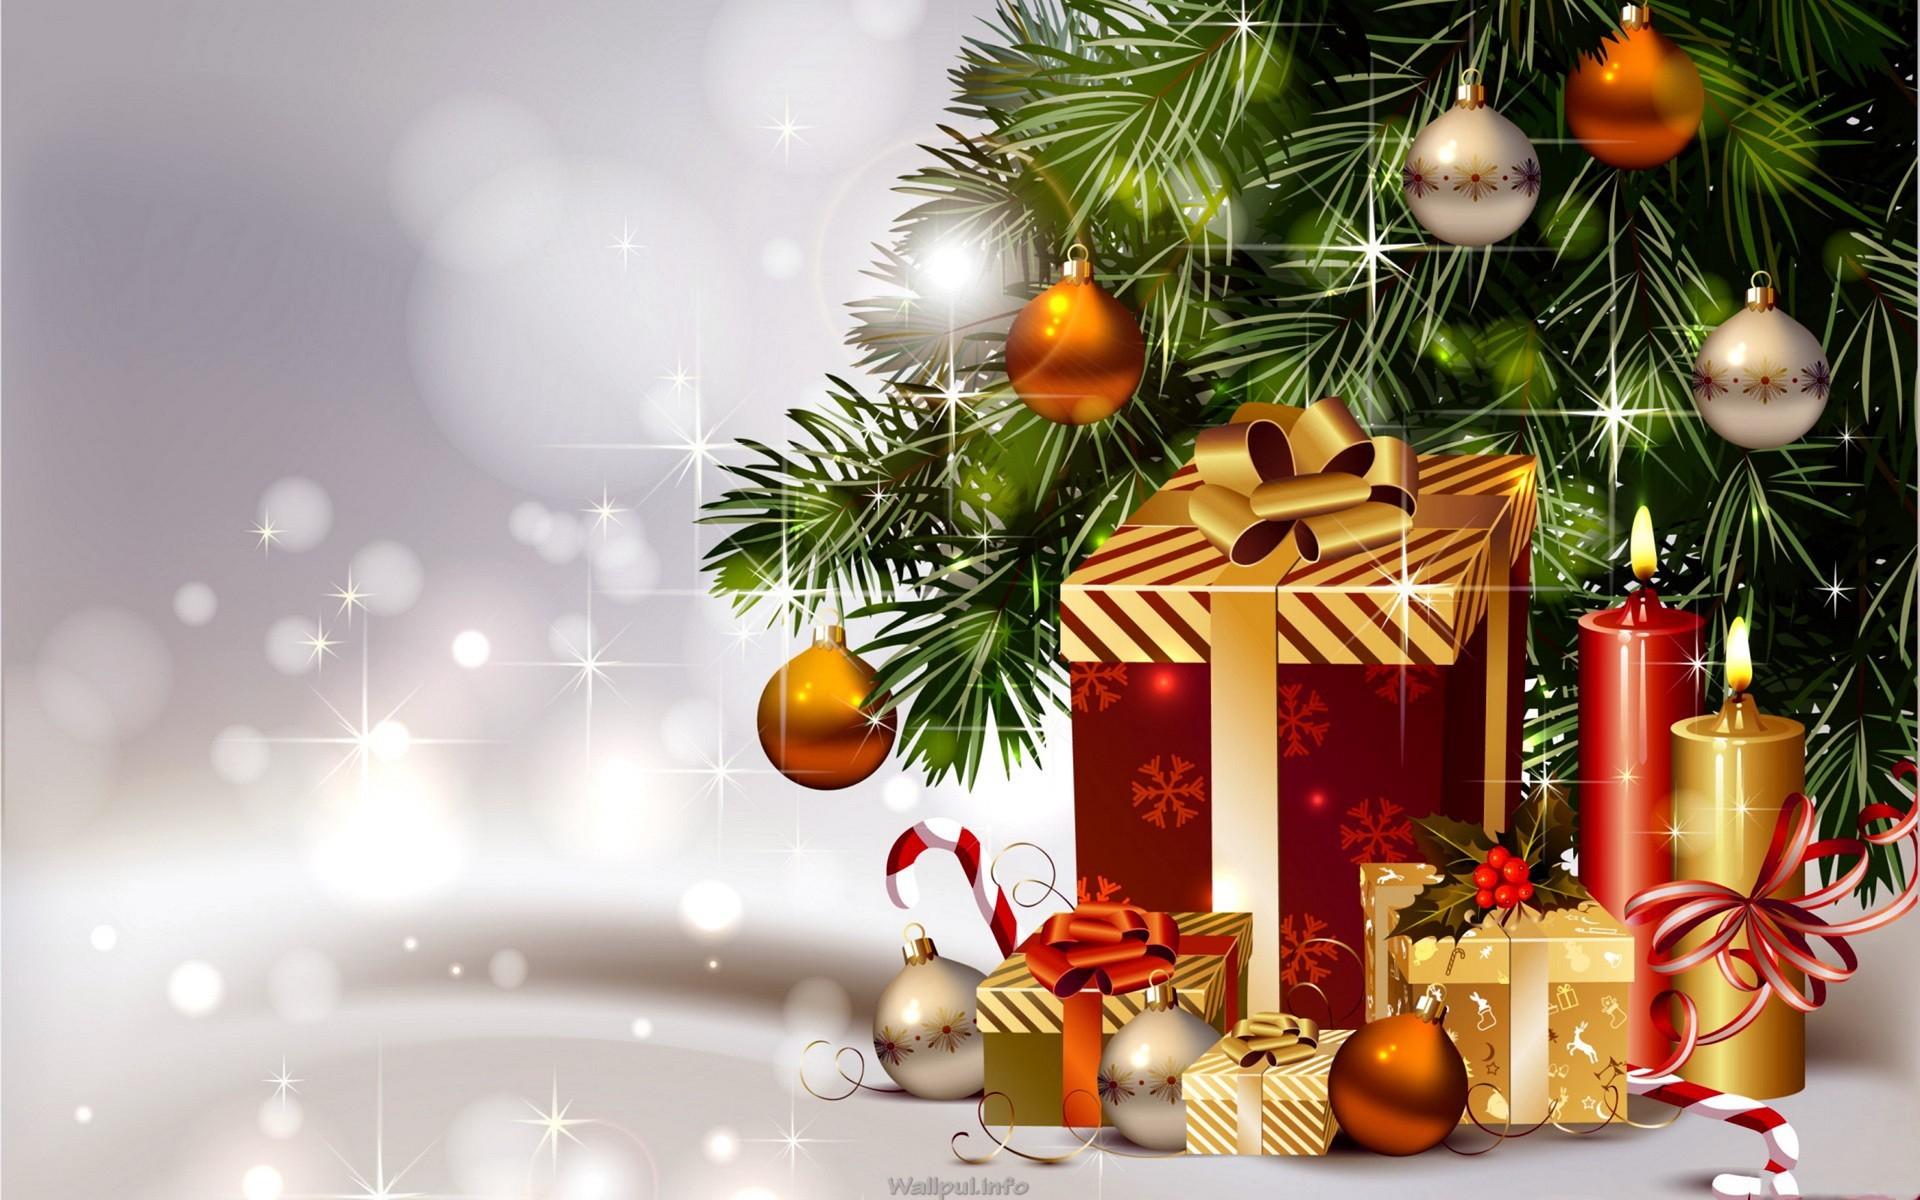 HD Christmas Wallpaper Widescreen (71+ Images